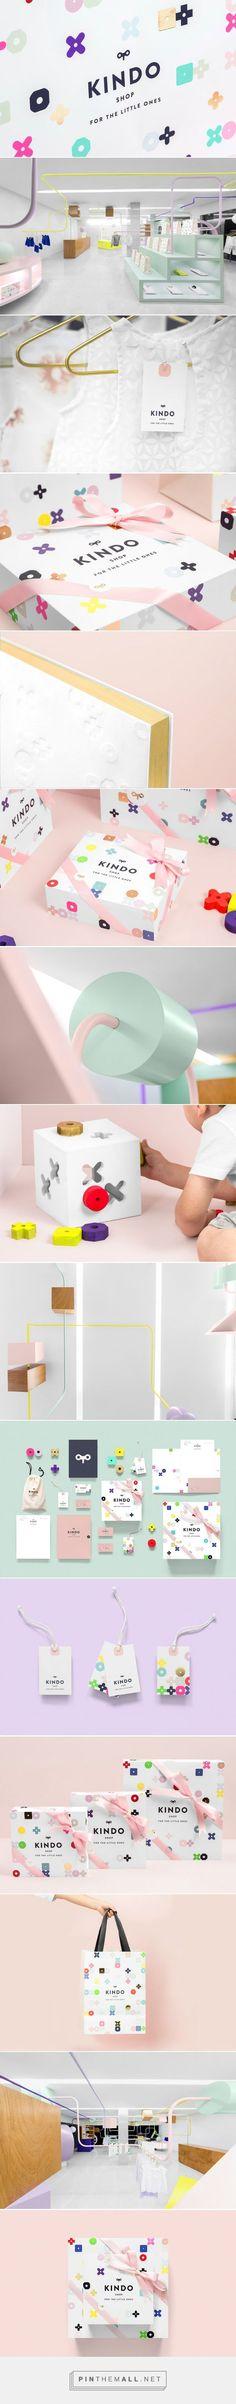 Kindo #Kids #Clothing #packaging designed by Anagrama - http://www.packagingoftheworld.com/2015/07/kindo.html: